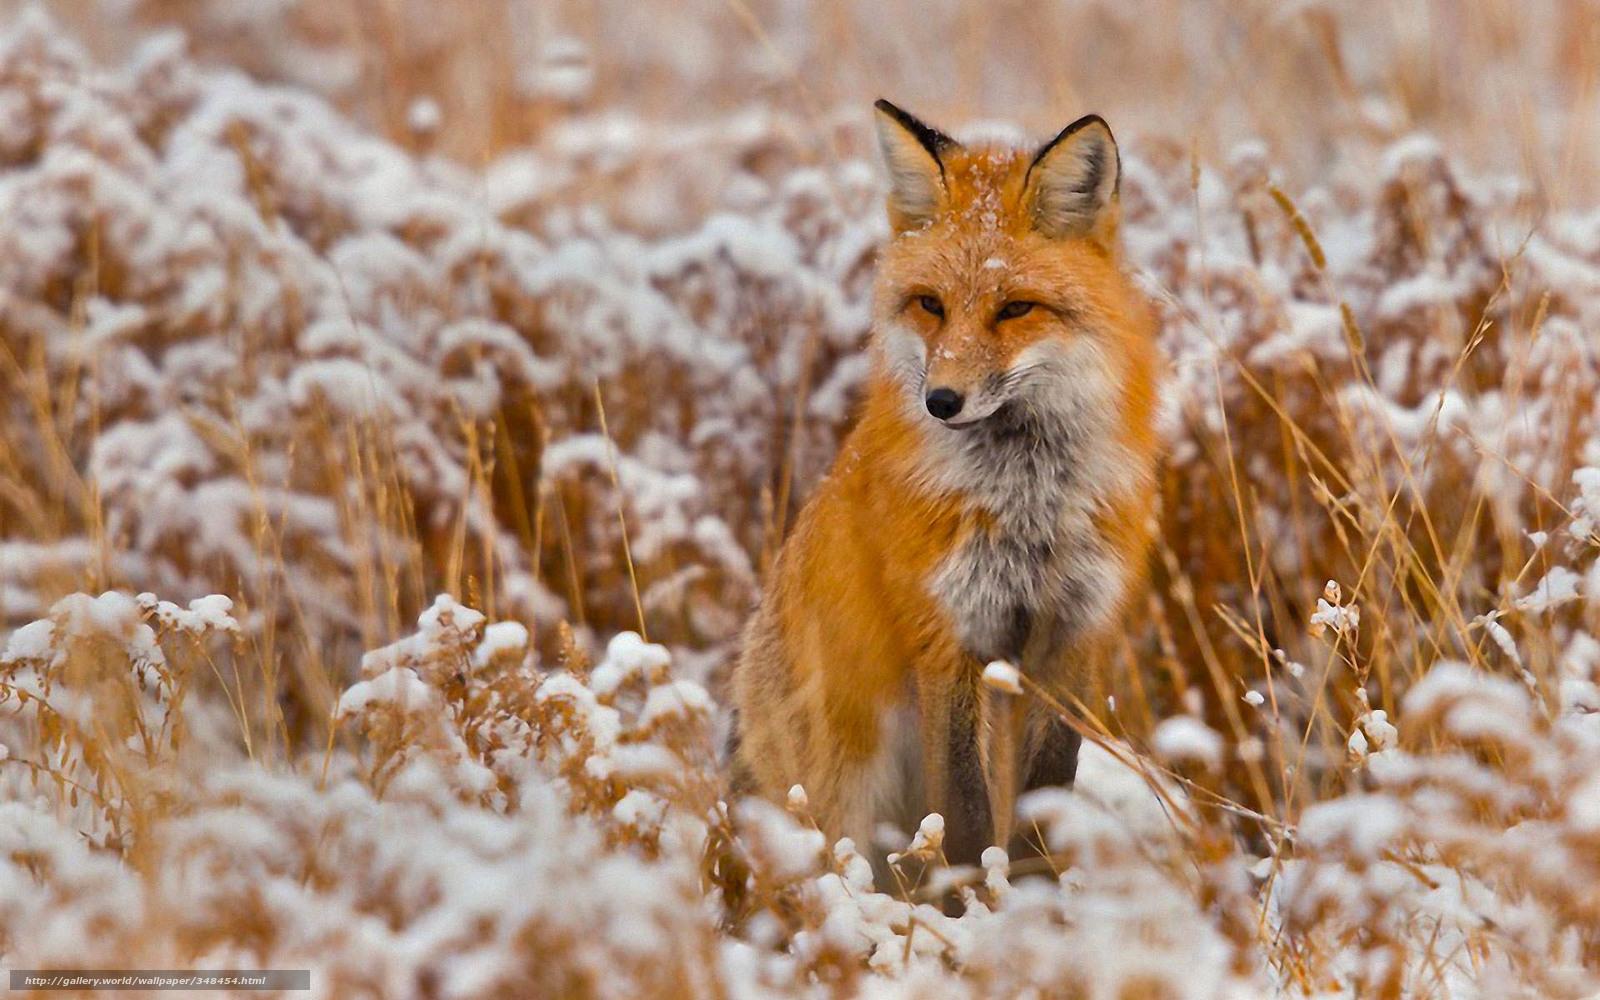 Tlcharger fond d 39 ecran animal renard hiver neige fonds for Fond ecran hiver animaux